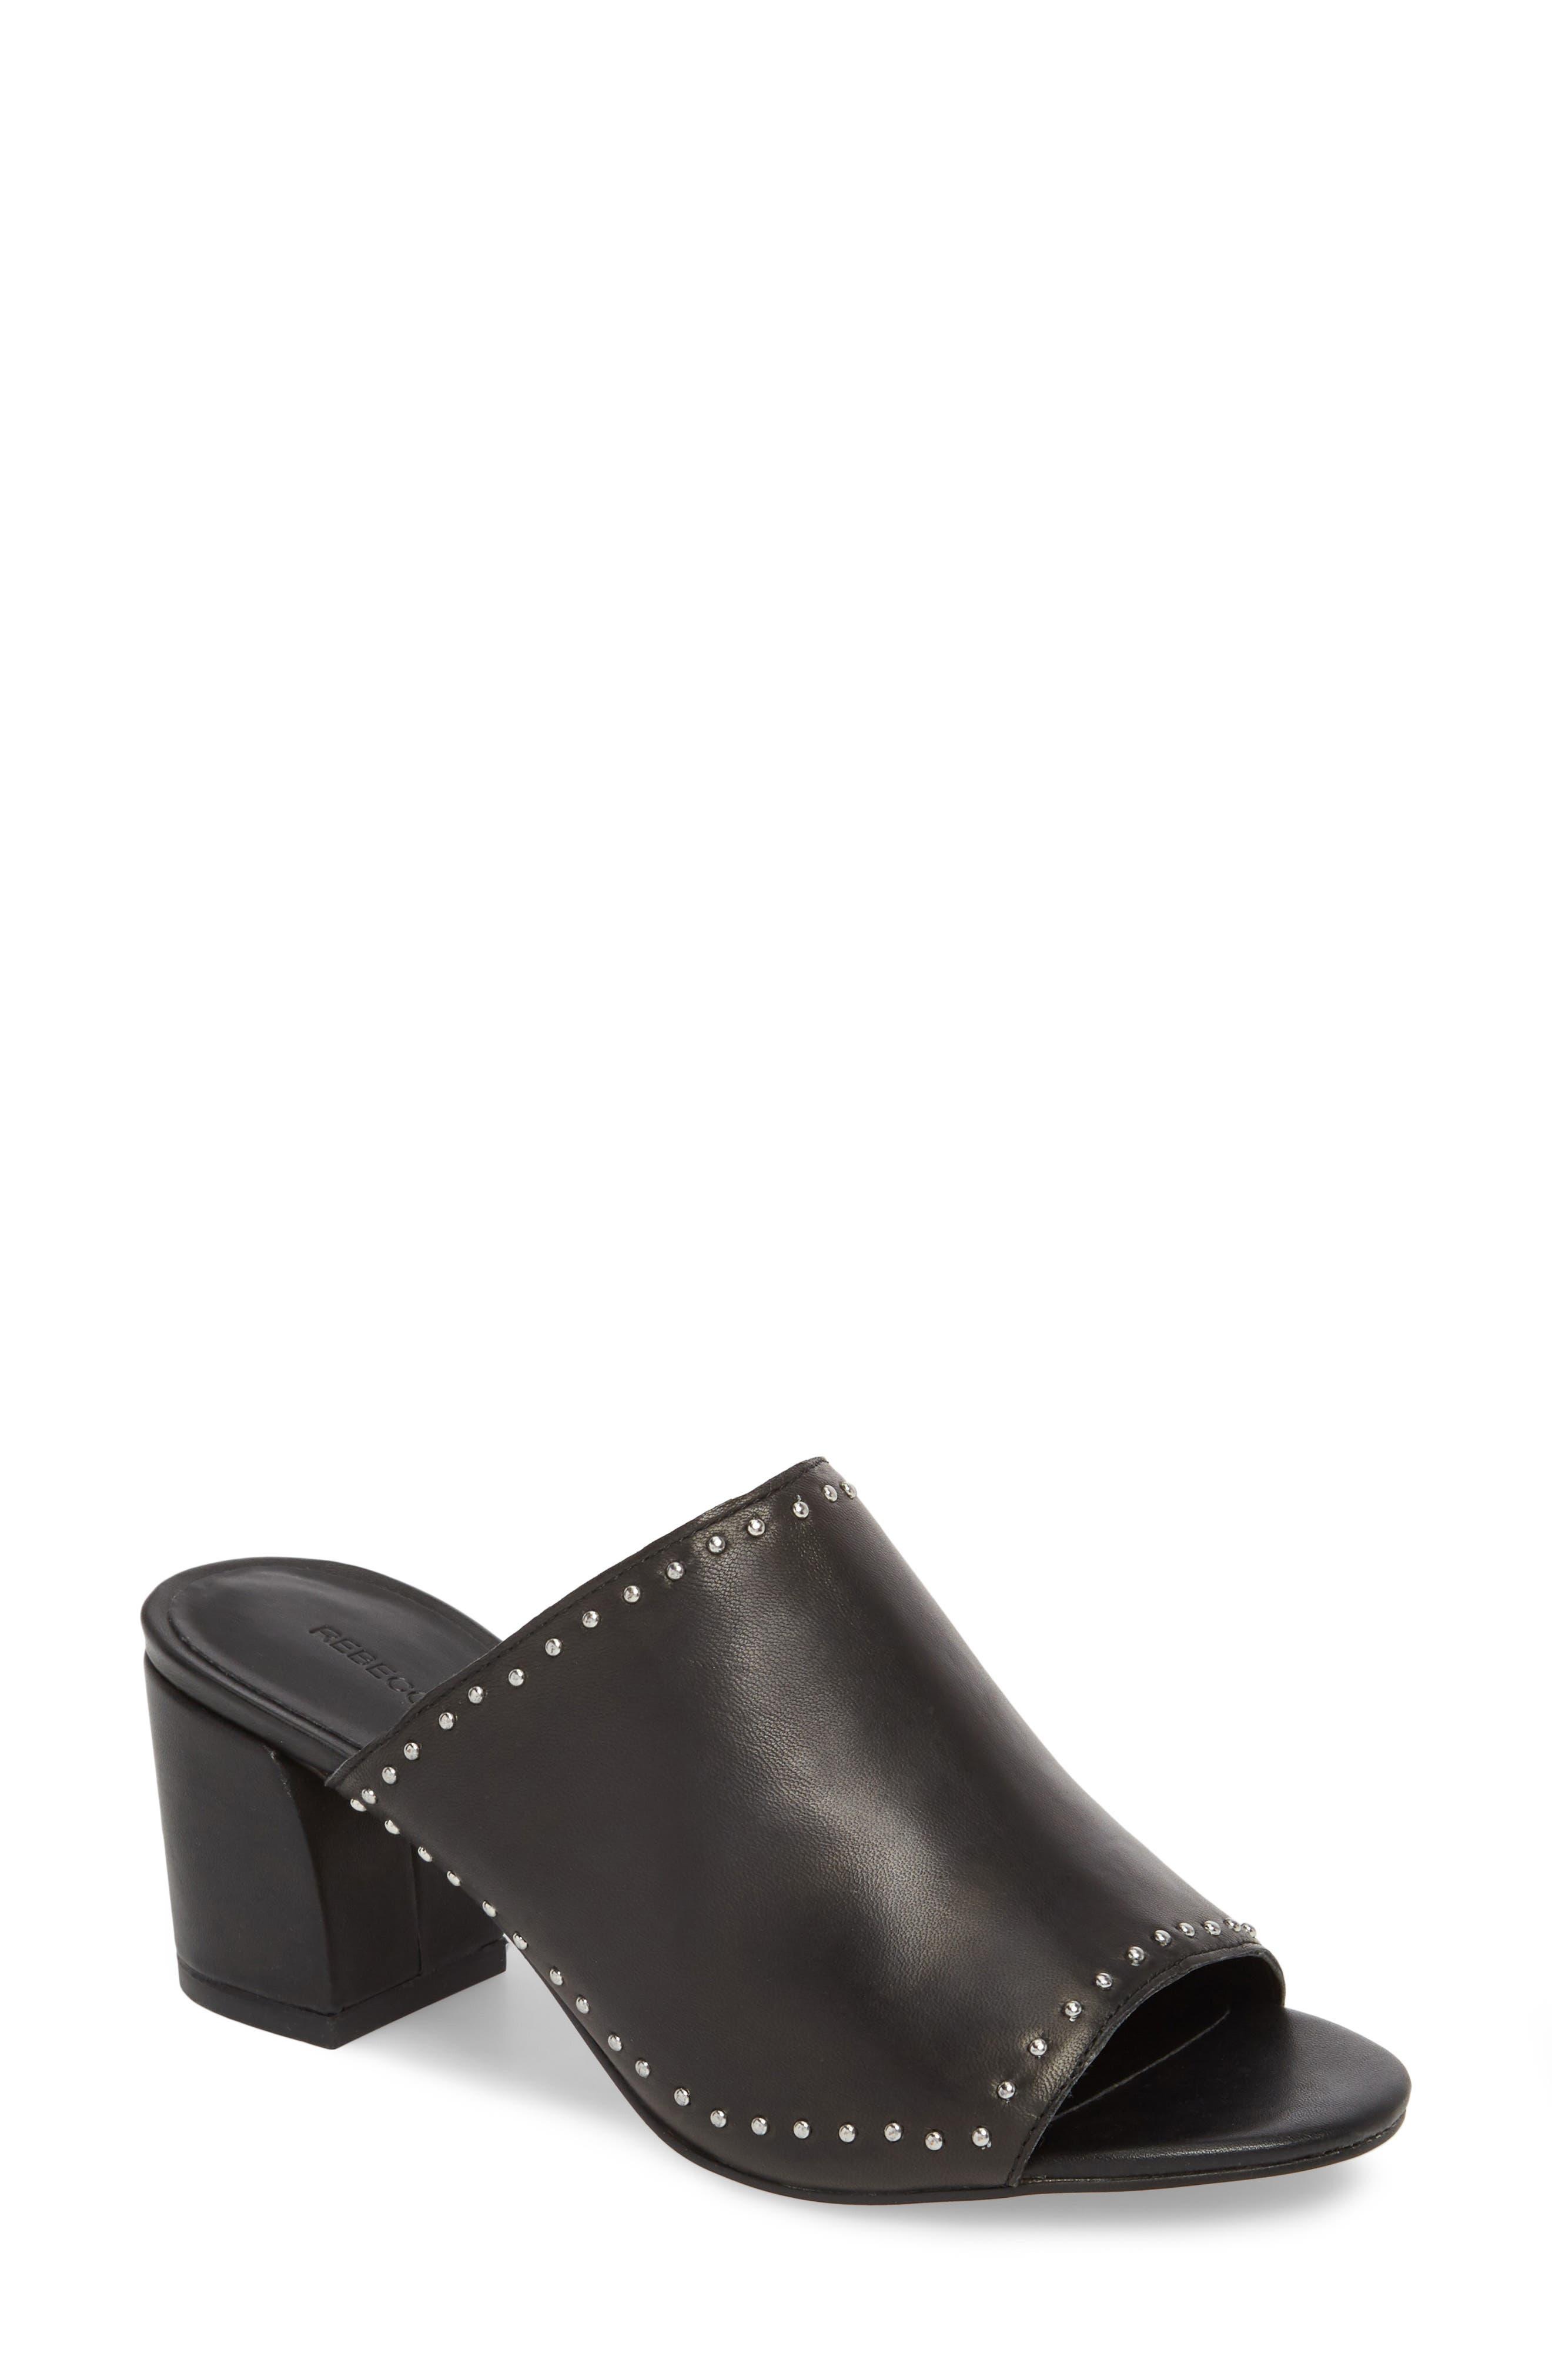 Lainy Studded Mule,                         Main,                         color, Black Leather